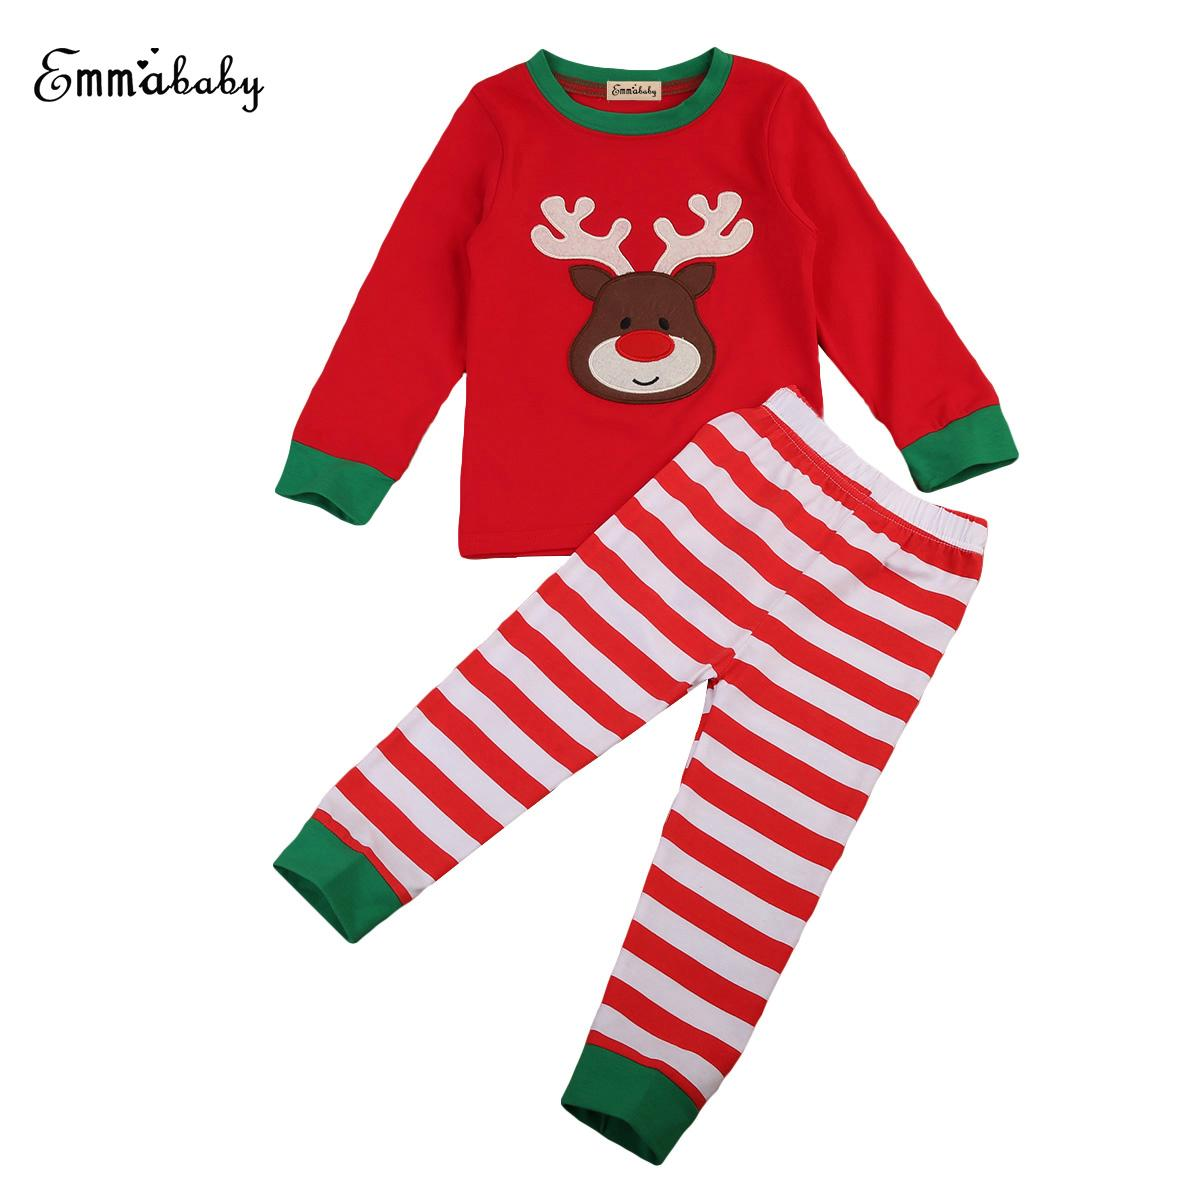 7c5b173db2 Kids Boy Girl Christmas Pajama Set Long Sleeve Tops+Striped Pant Nightwear  Toddler Baby Boys Girls Clothes 1 7Y Pajama Sets For Boys Christmas Pajamas  For ...